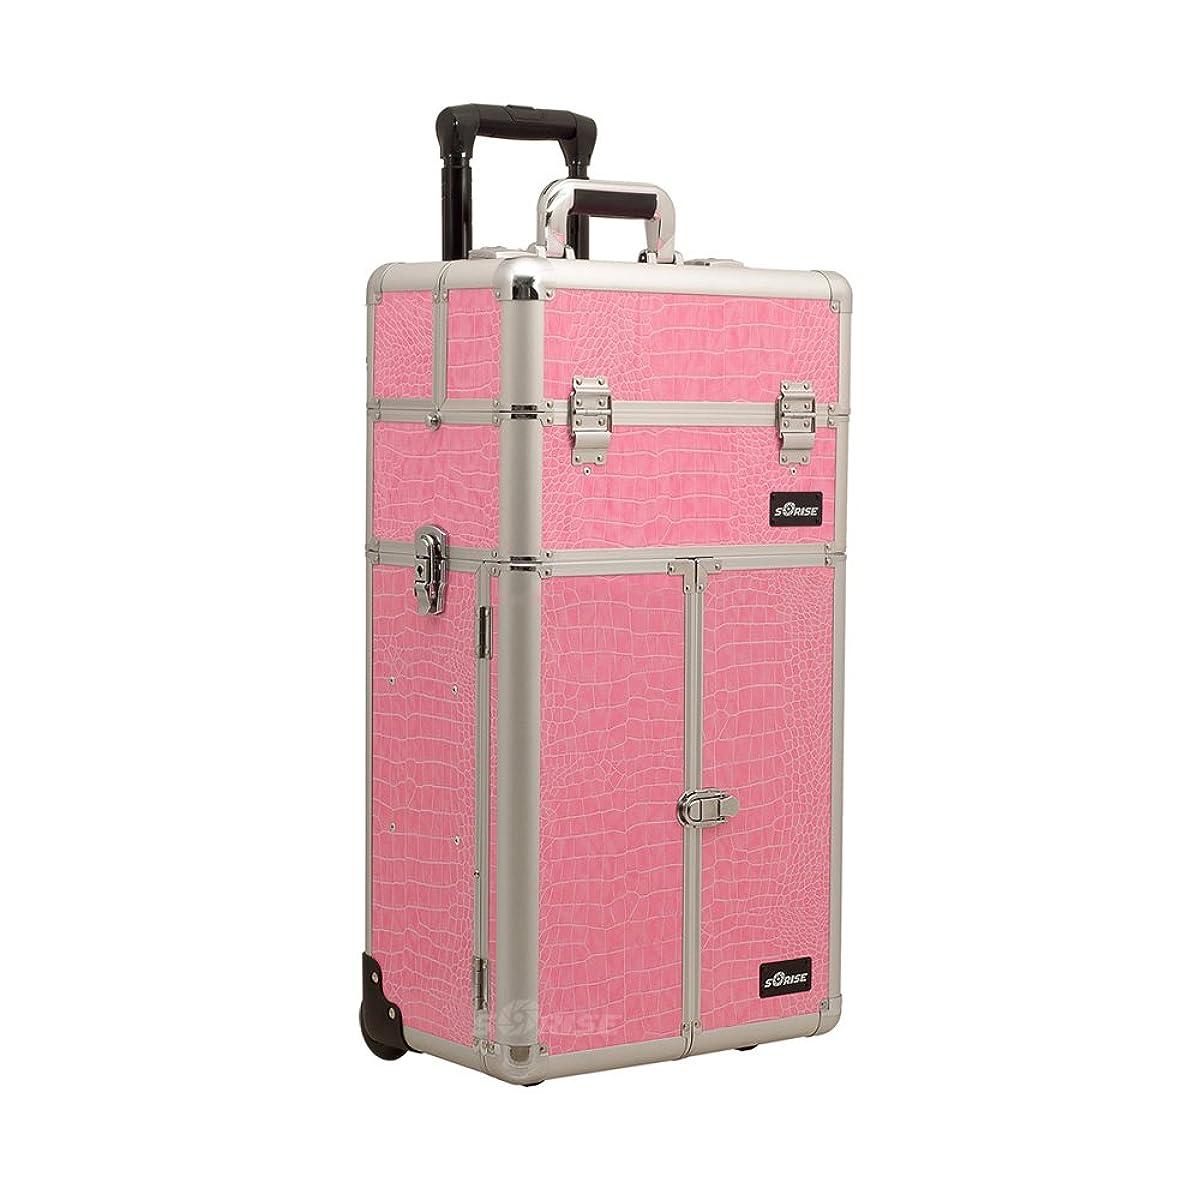 Craft Accents I3265 Croc Trolley Craft/Quilting Storage Case, Pink